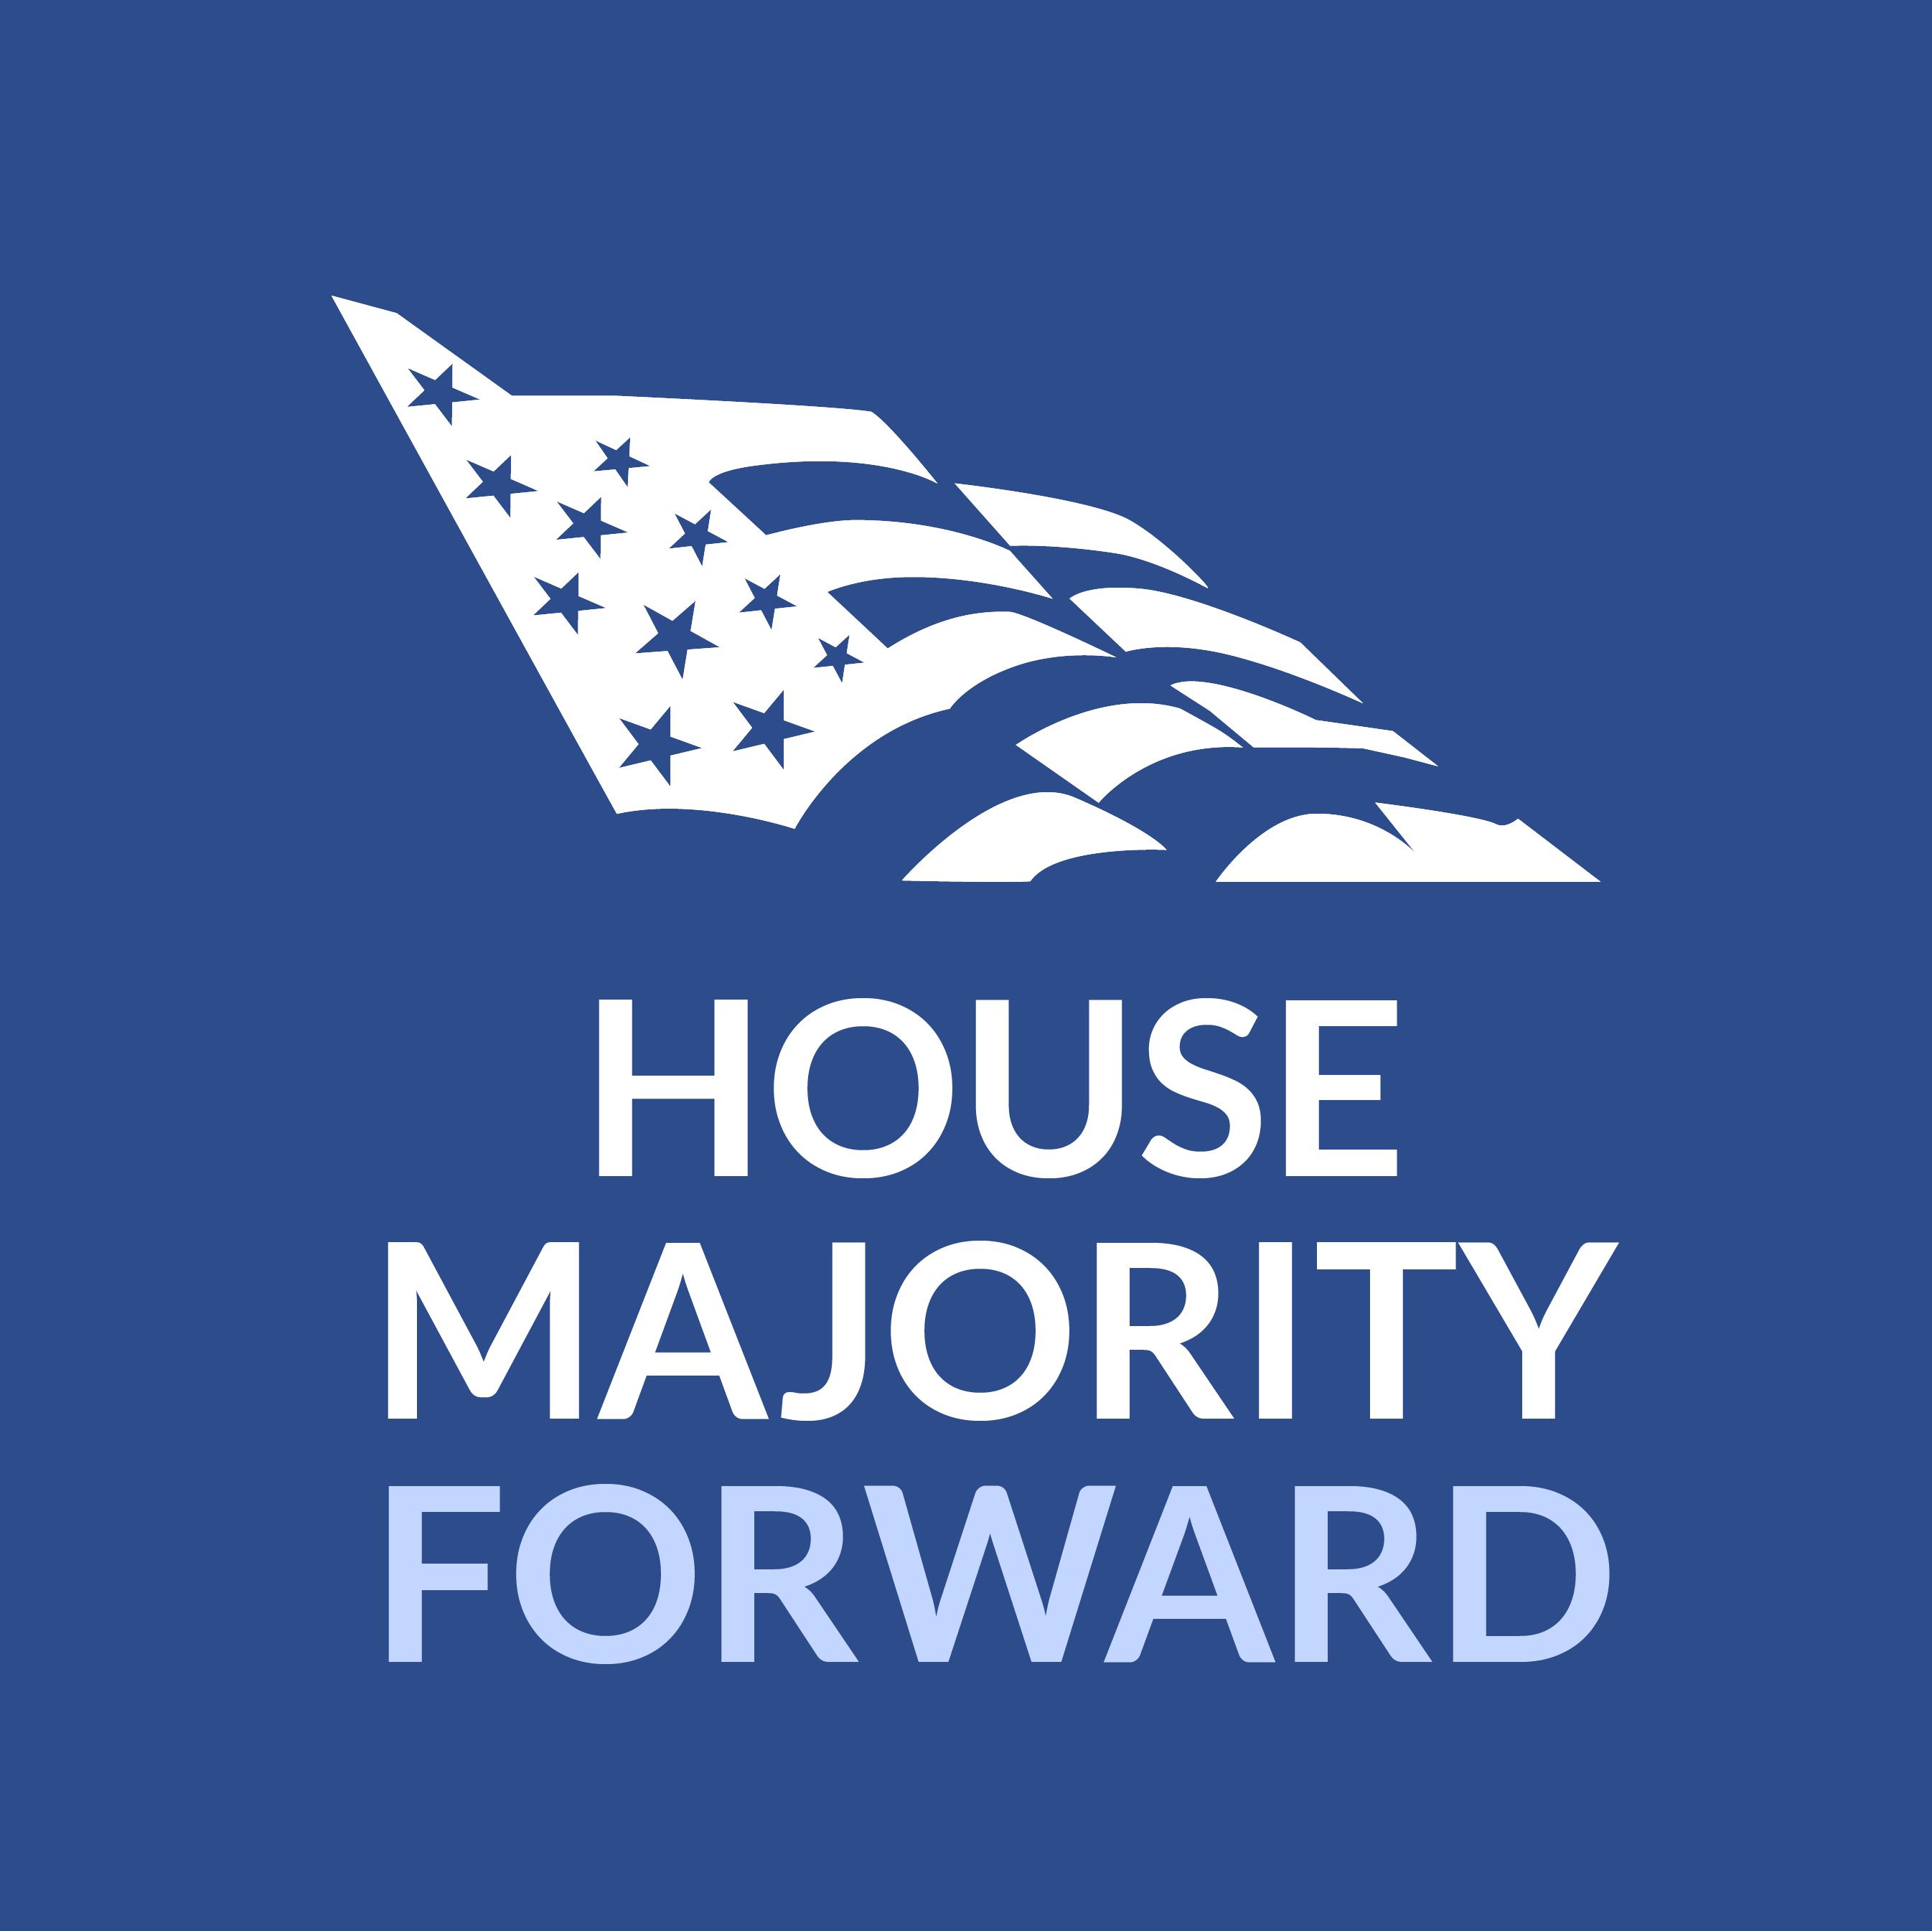 House Majority Forward